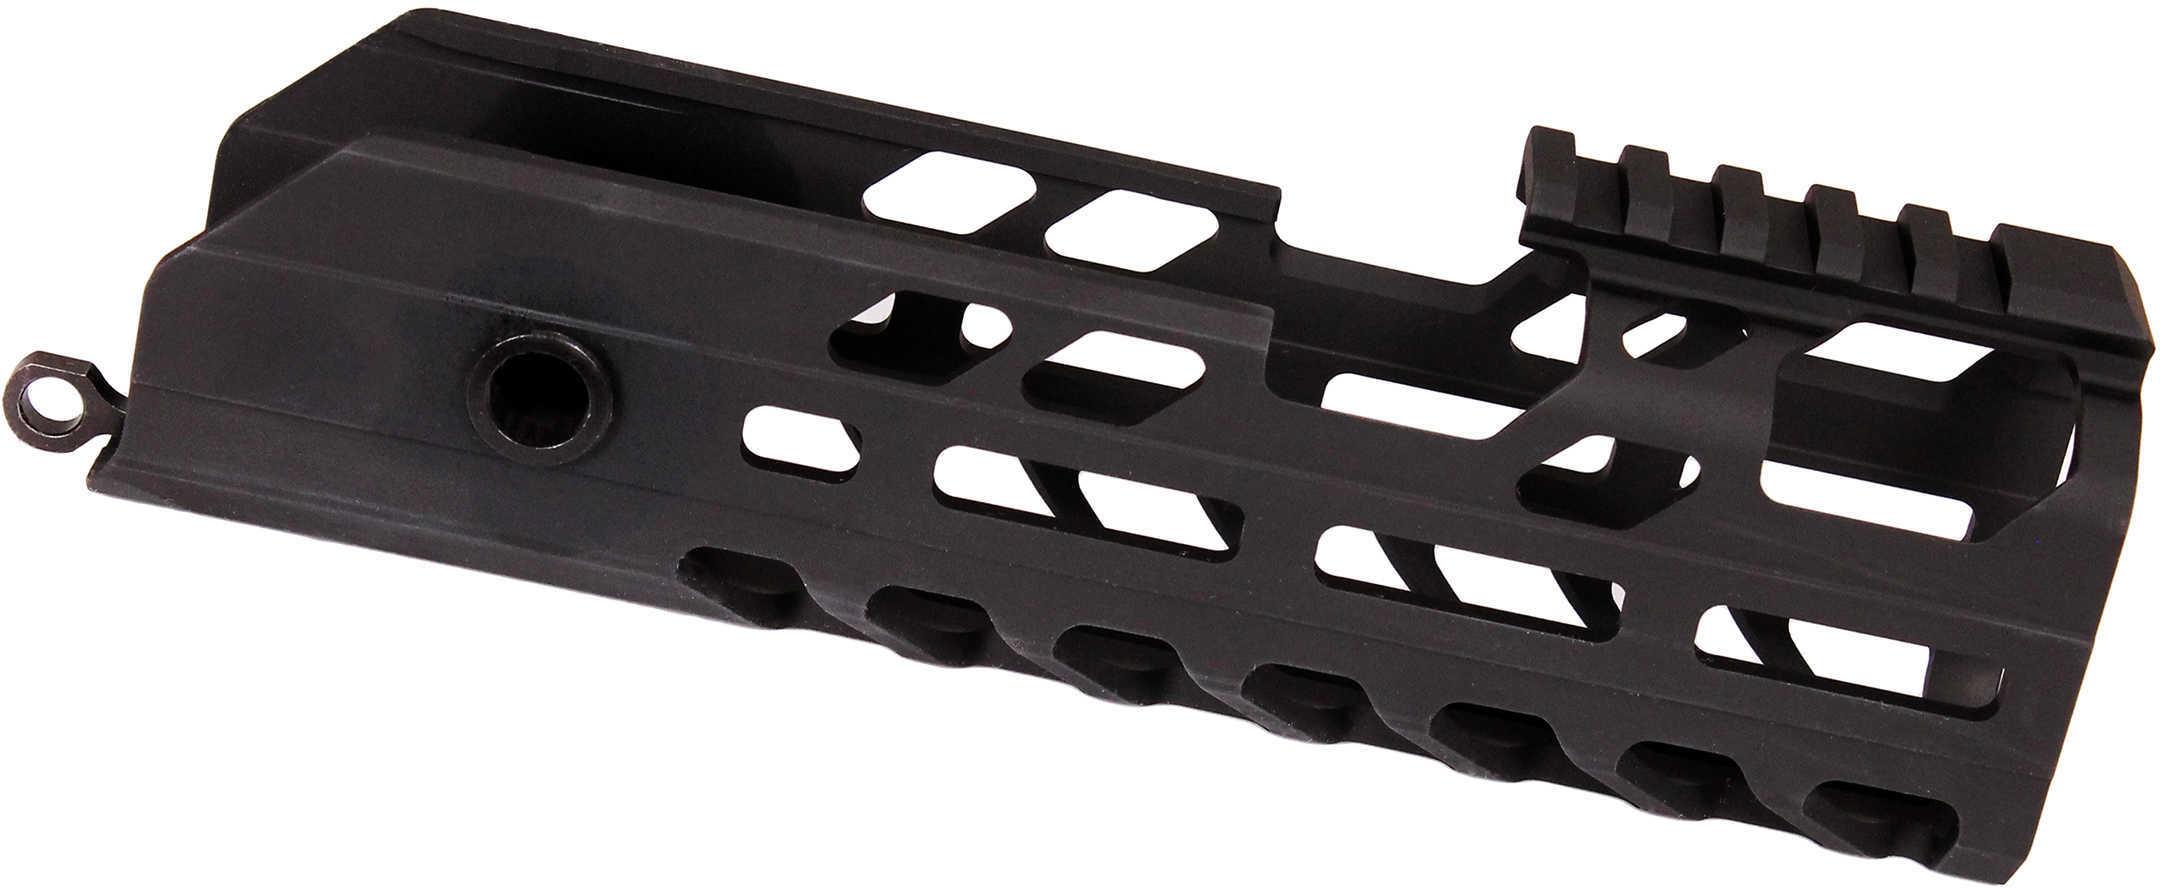 Sig Sauer MCX Handguard Low Profile, Aluminum, M-Lok, Black